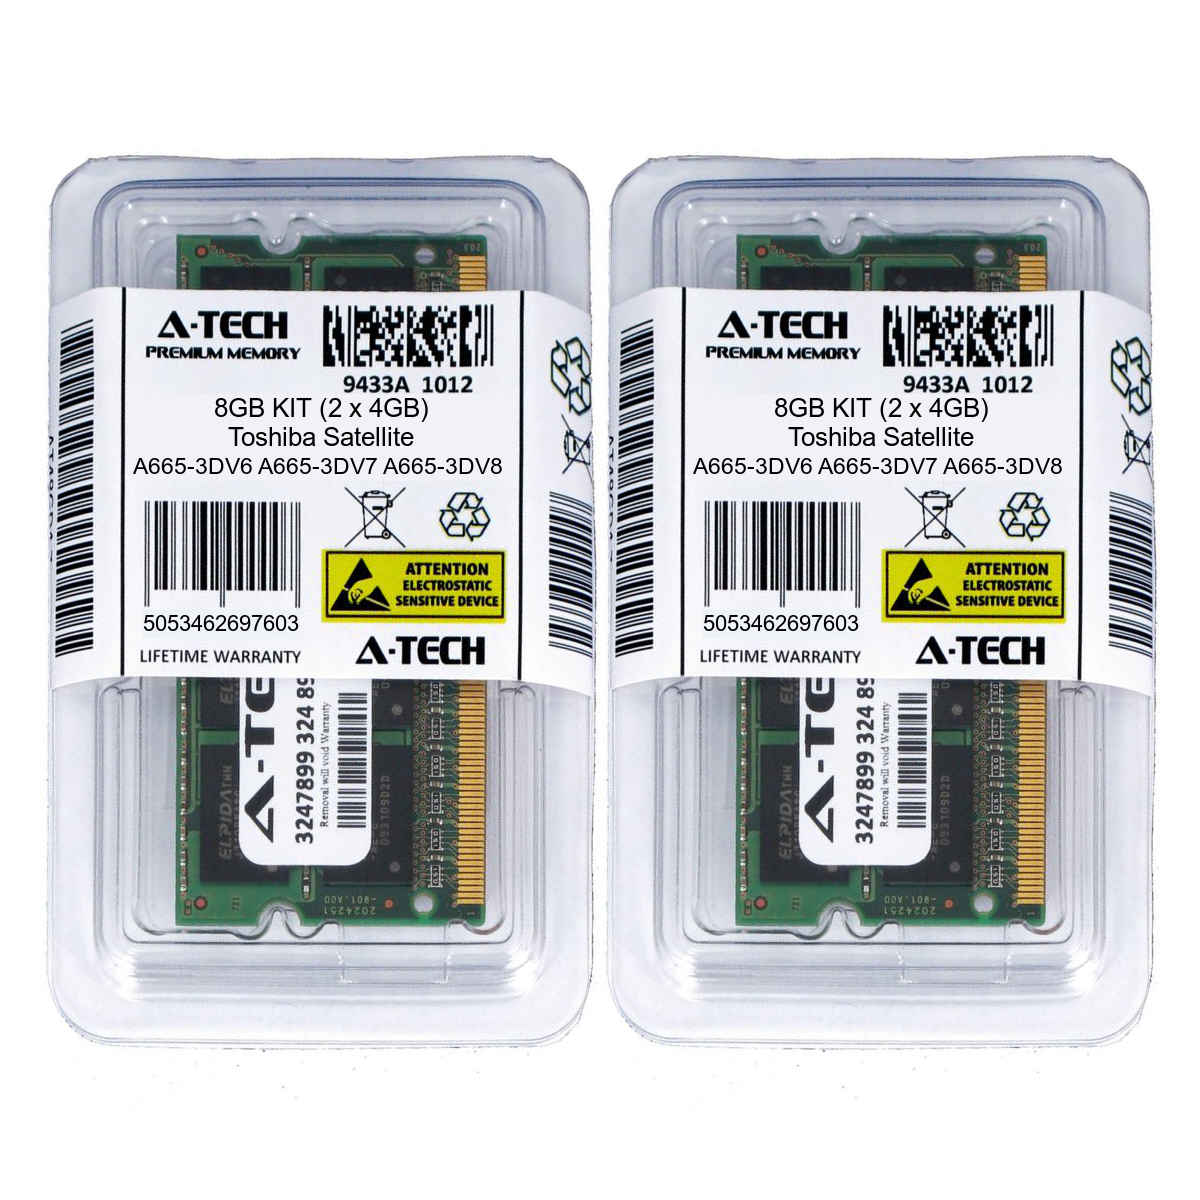 8GB KIT 2 x 4GB Toshiba Satellite A665-3DV6 A665-3DV7 A665-3DV8 Ram Memory